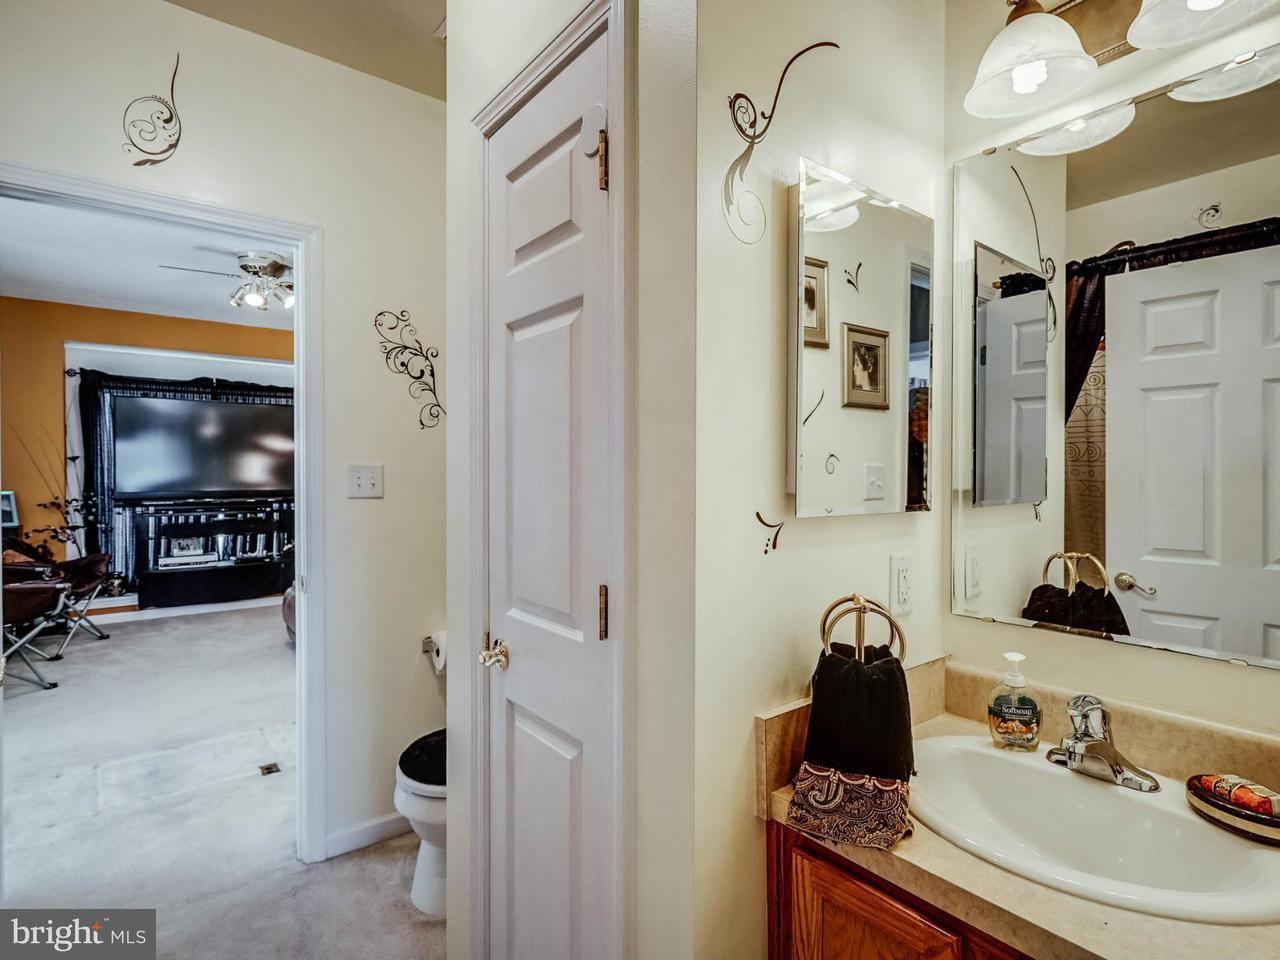 Additional photo for property listing at 2561 PEACH GROVE Road 2561 PEACH GROVE Road Louisa, 버지니아 23093 미국